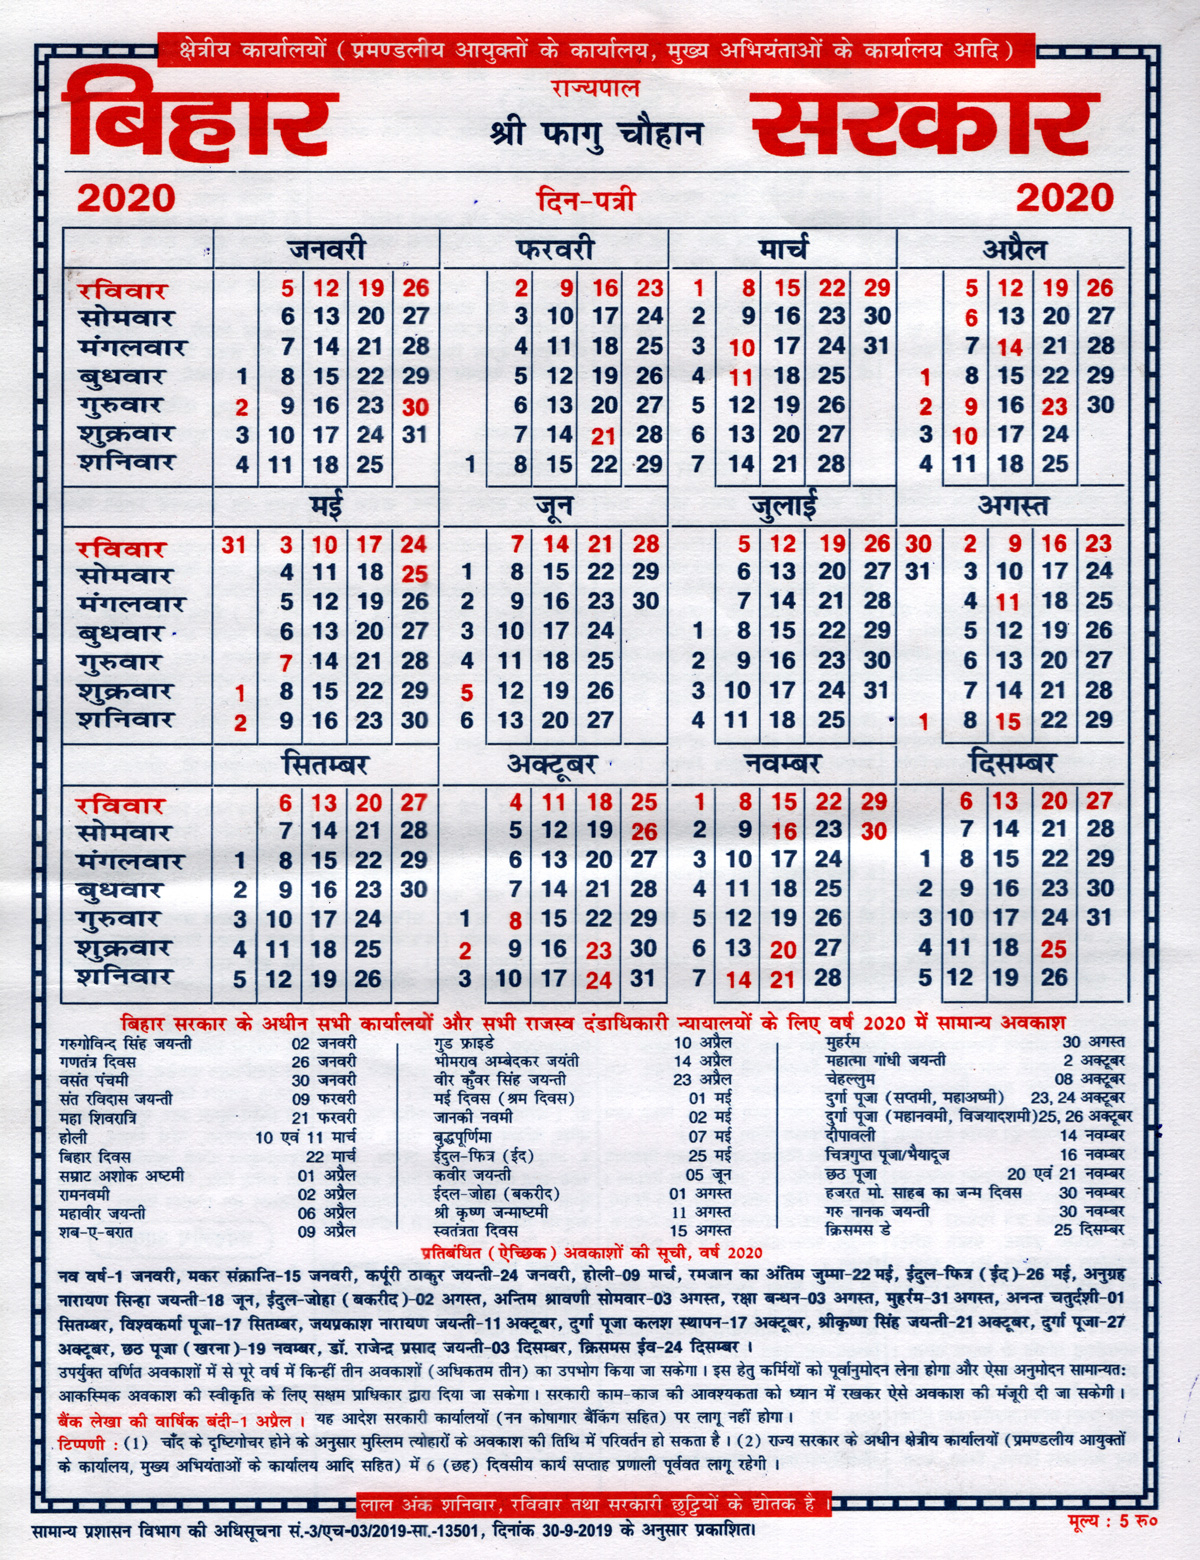 Bihar Govt. Calendar  Patna Bihar Directory with regard to Bihar Govt Calander